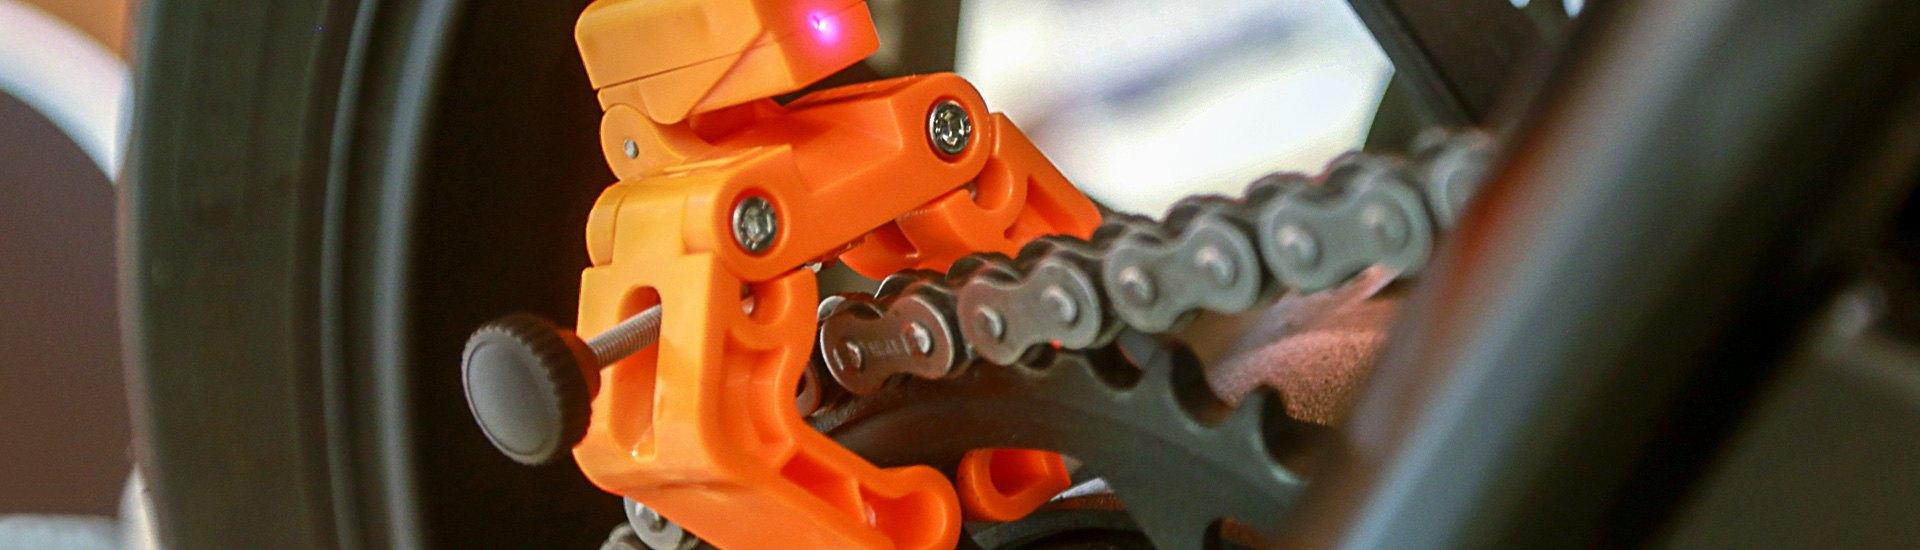 Pro Series Rear Brake Cable Adjusting Bolt Honda CA105 CA200 CT200 SS125 S90